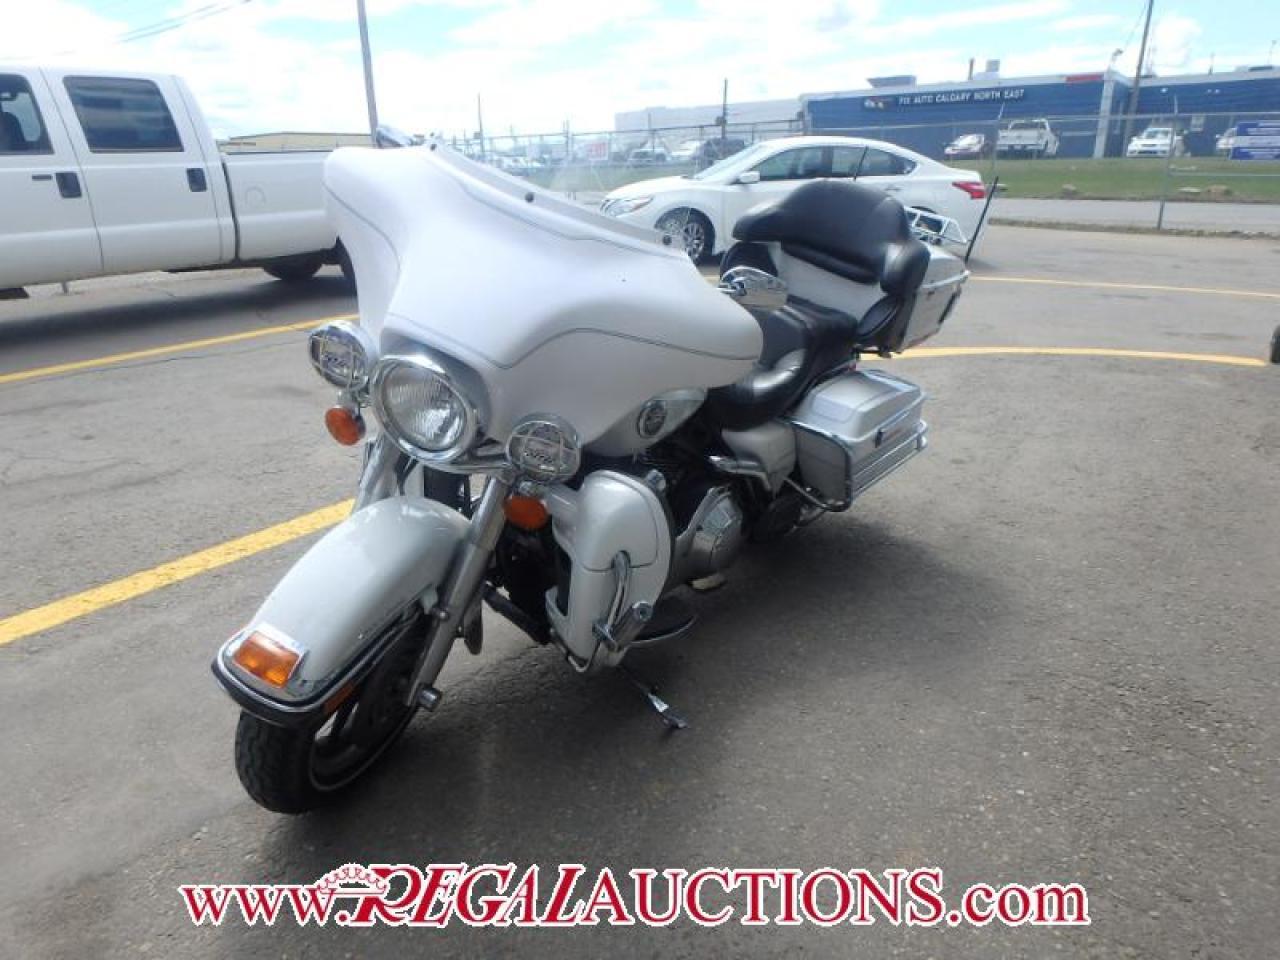 Photo of White 2007 HARLEY DAVISDSON ULTRA CLASSIC ELECTROGLIDE TOURING MOTORCYCLE